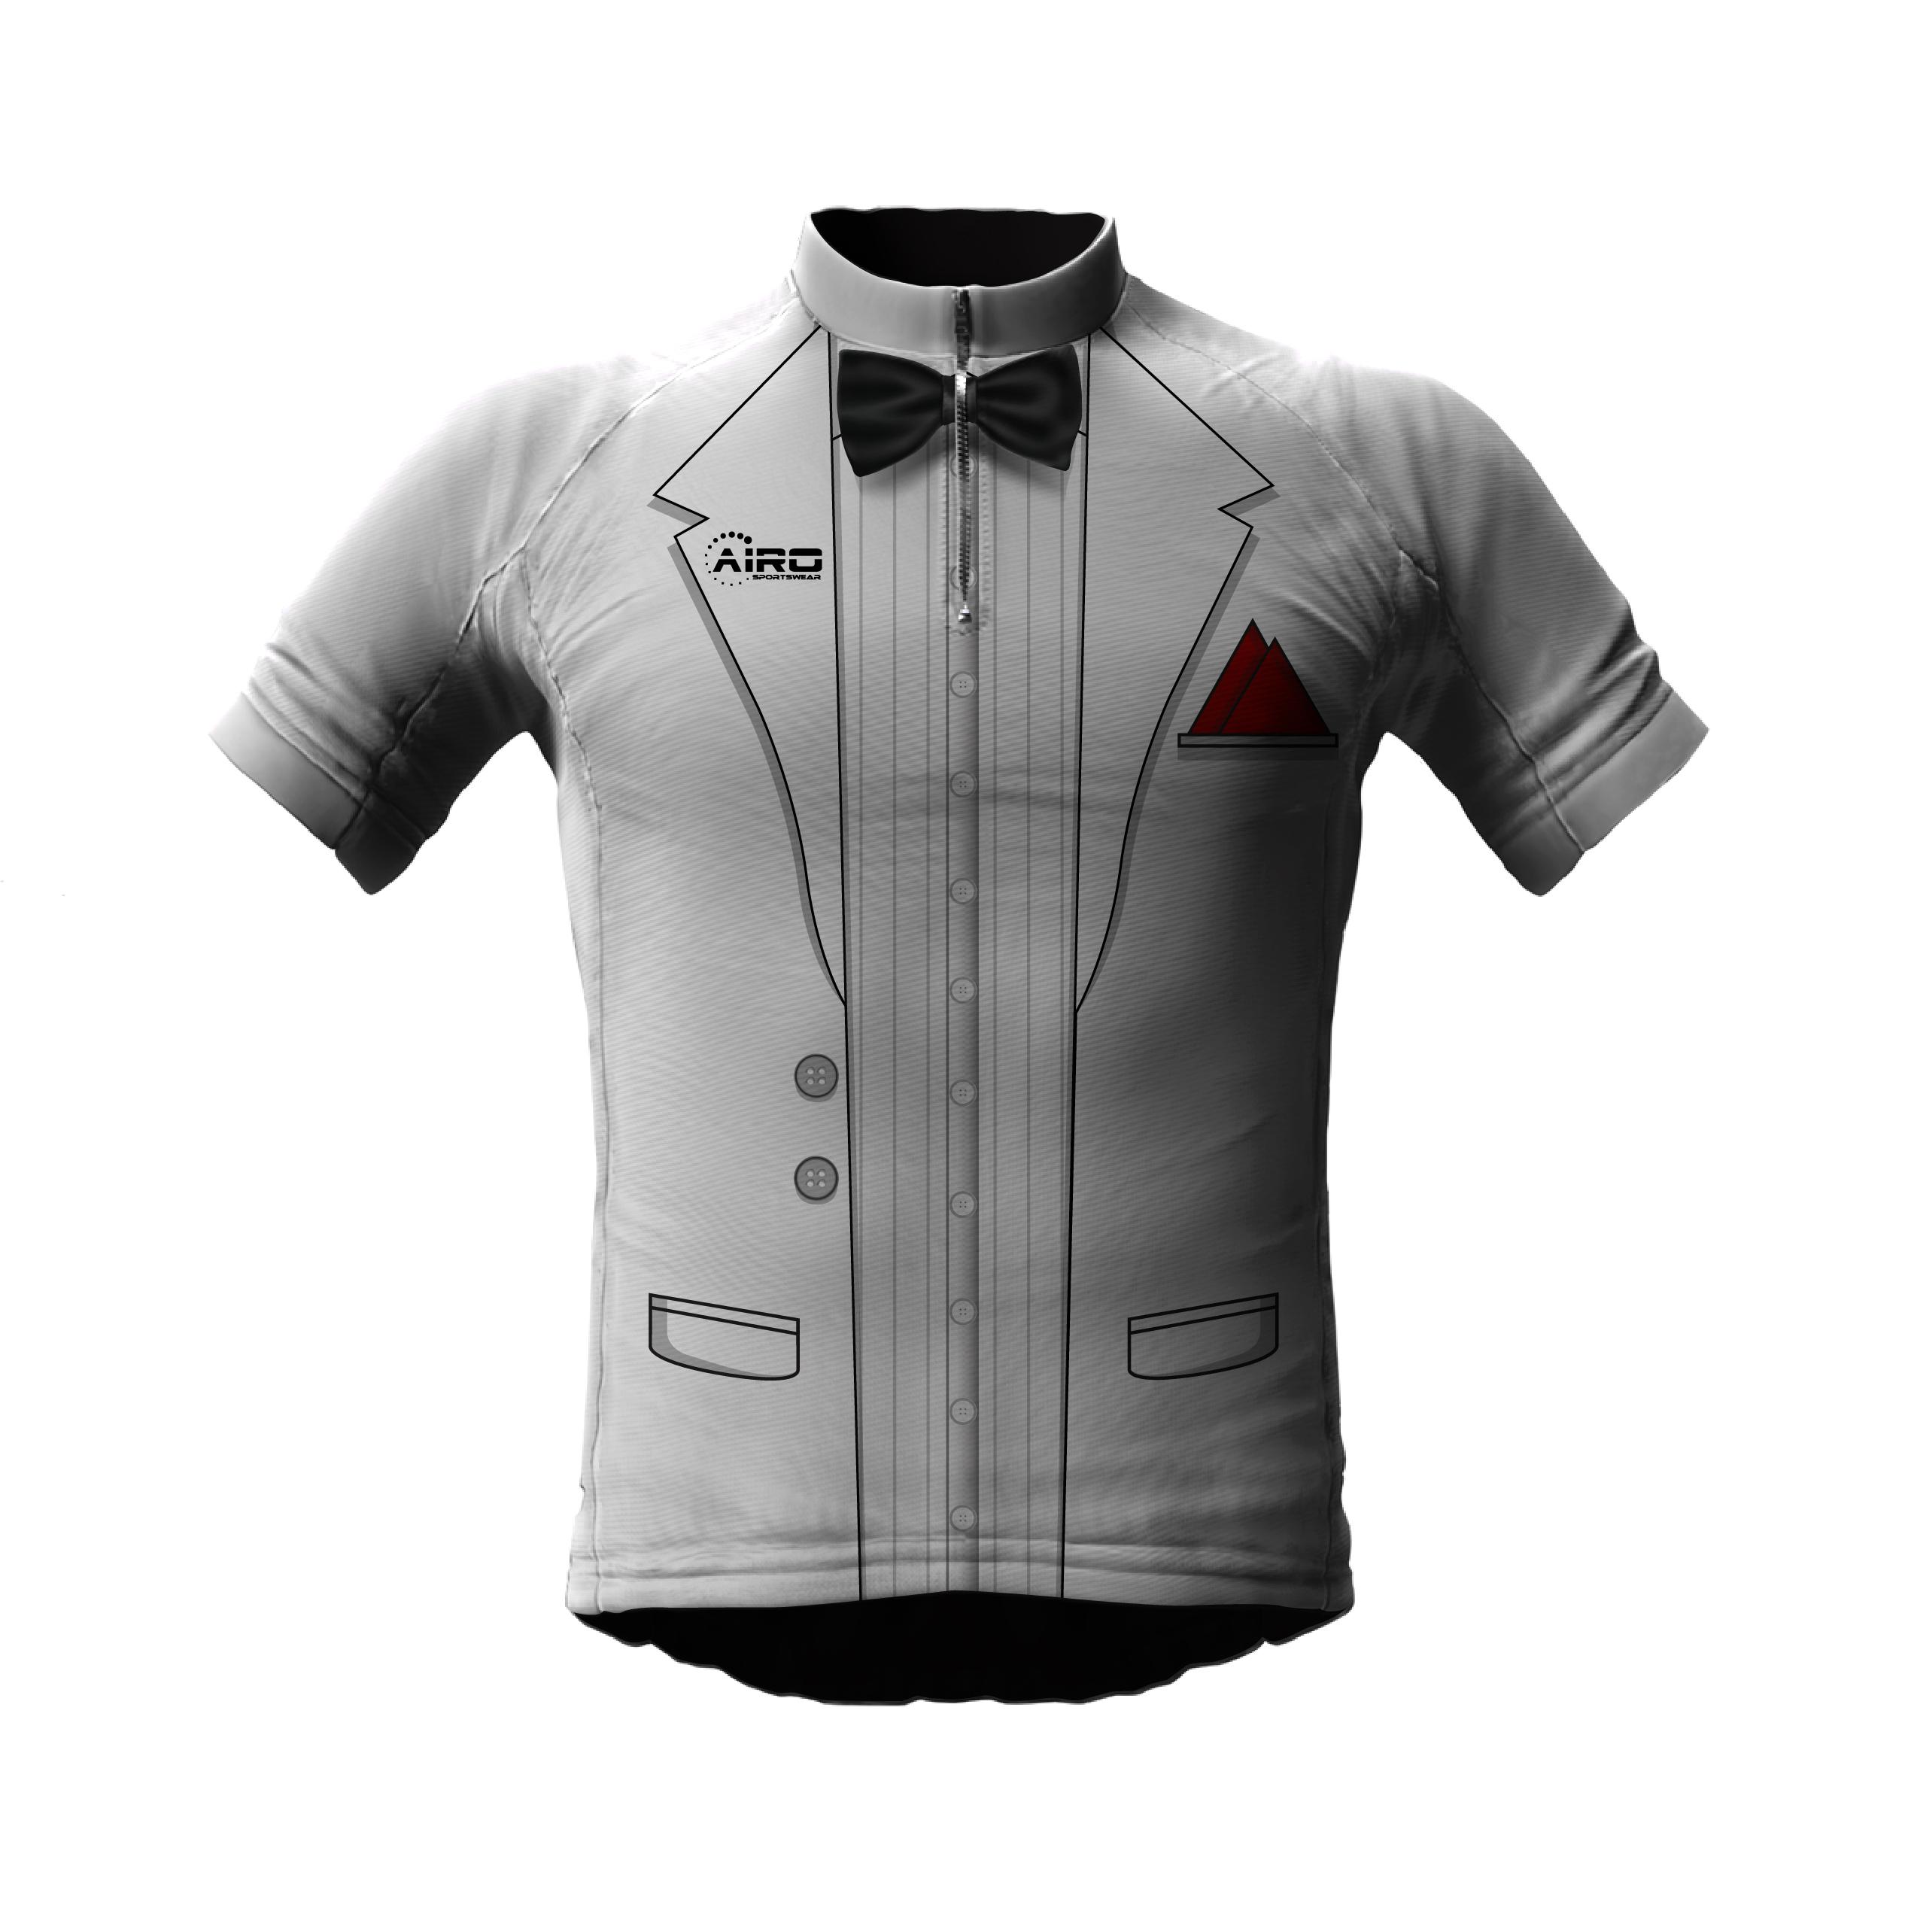 Image of Airosportswear Tuxedo Cycling Jersey